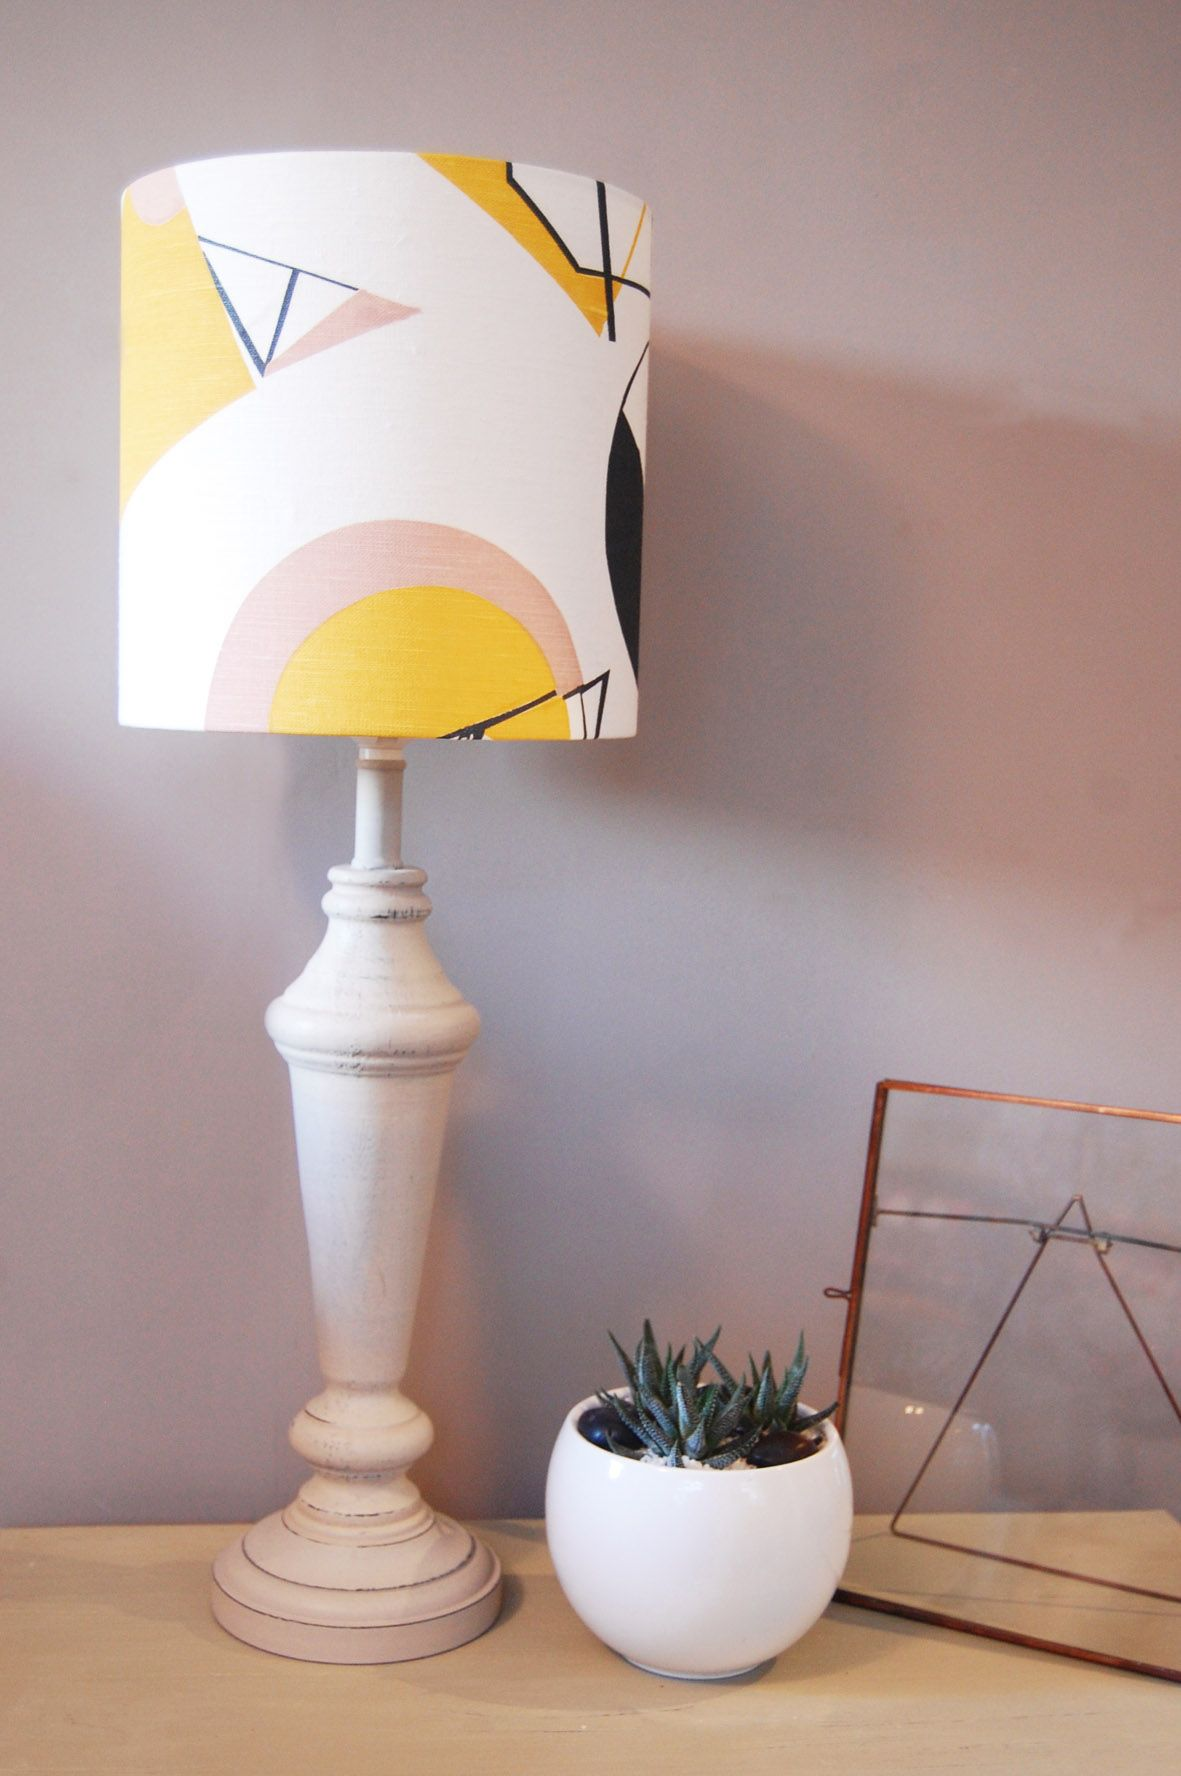 Geo Lampshade Lamp Shades Homewares Styling Floor Standing Lamps